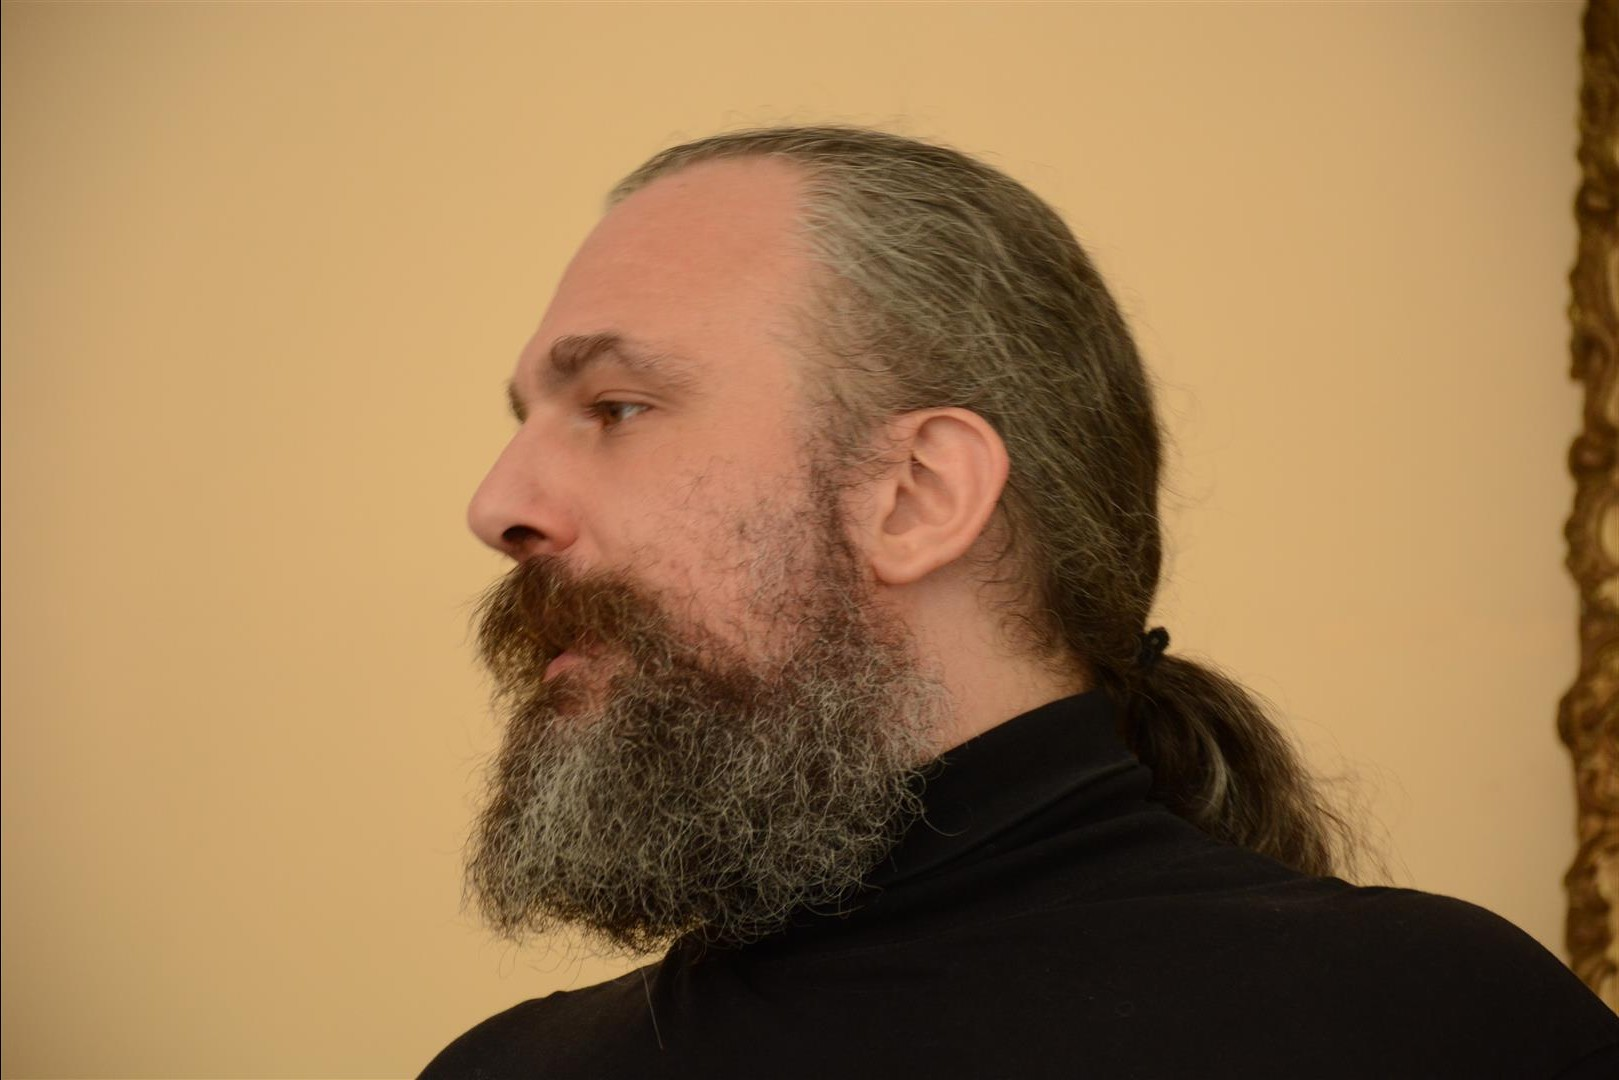 Conte et harpe - Raphaël Demoulin